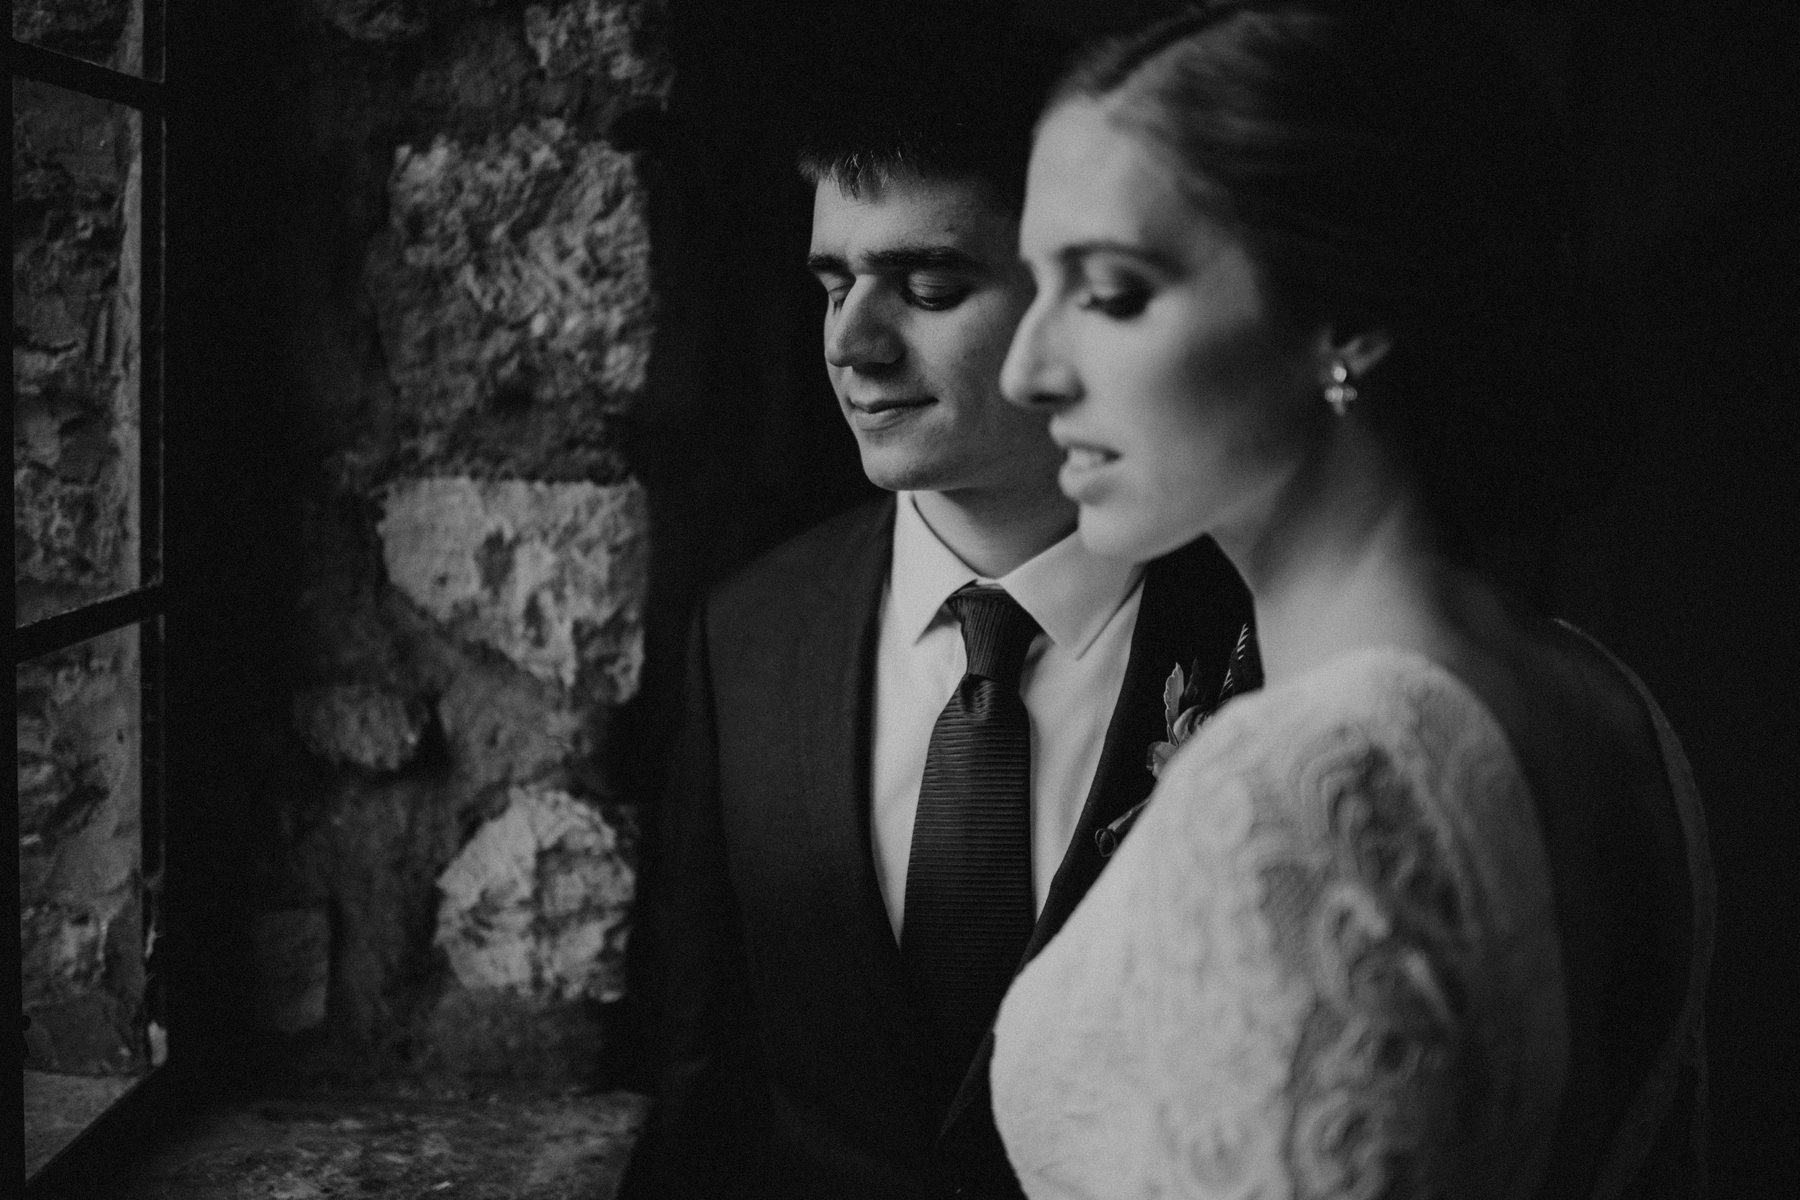 144-135-holly-hedge-wedding-9.jpg